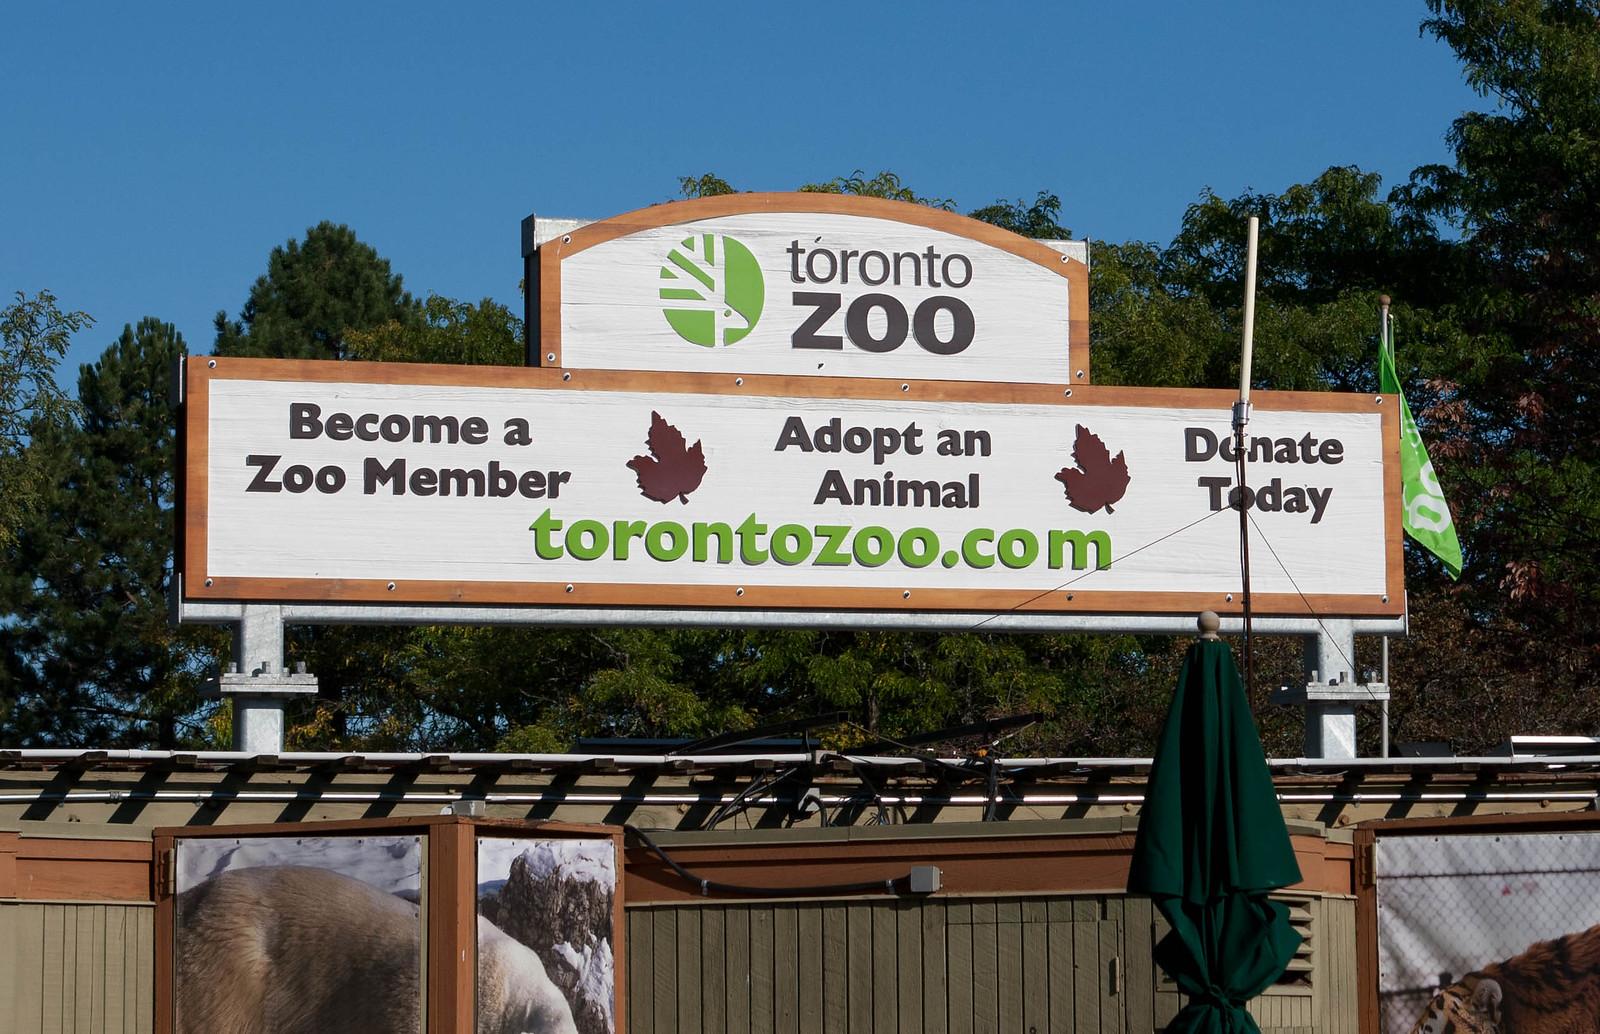 Toronto Zoo - September 2011